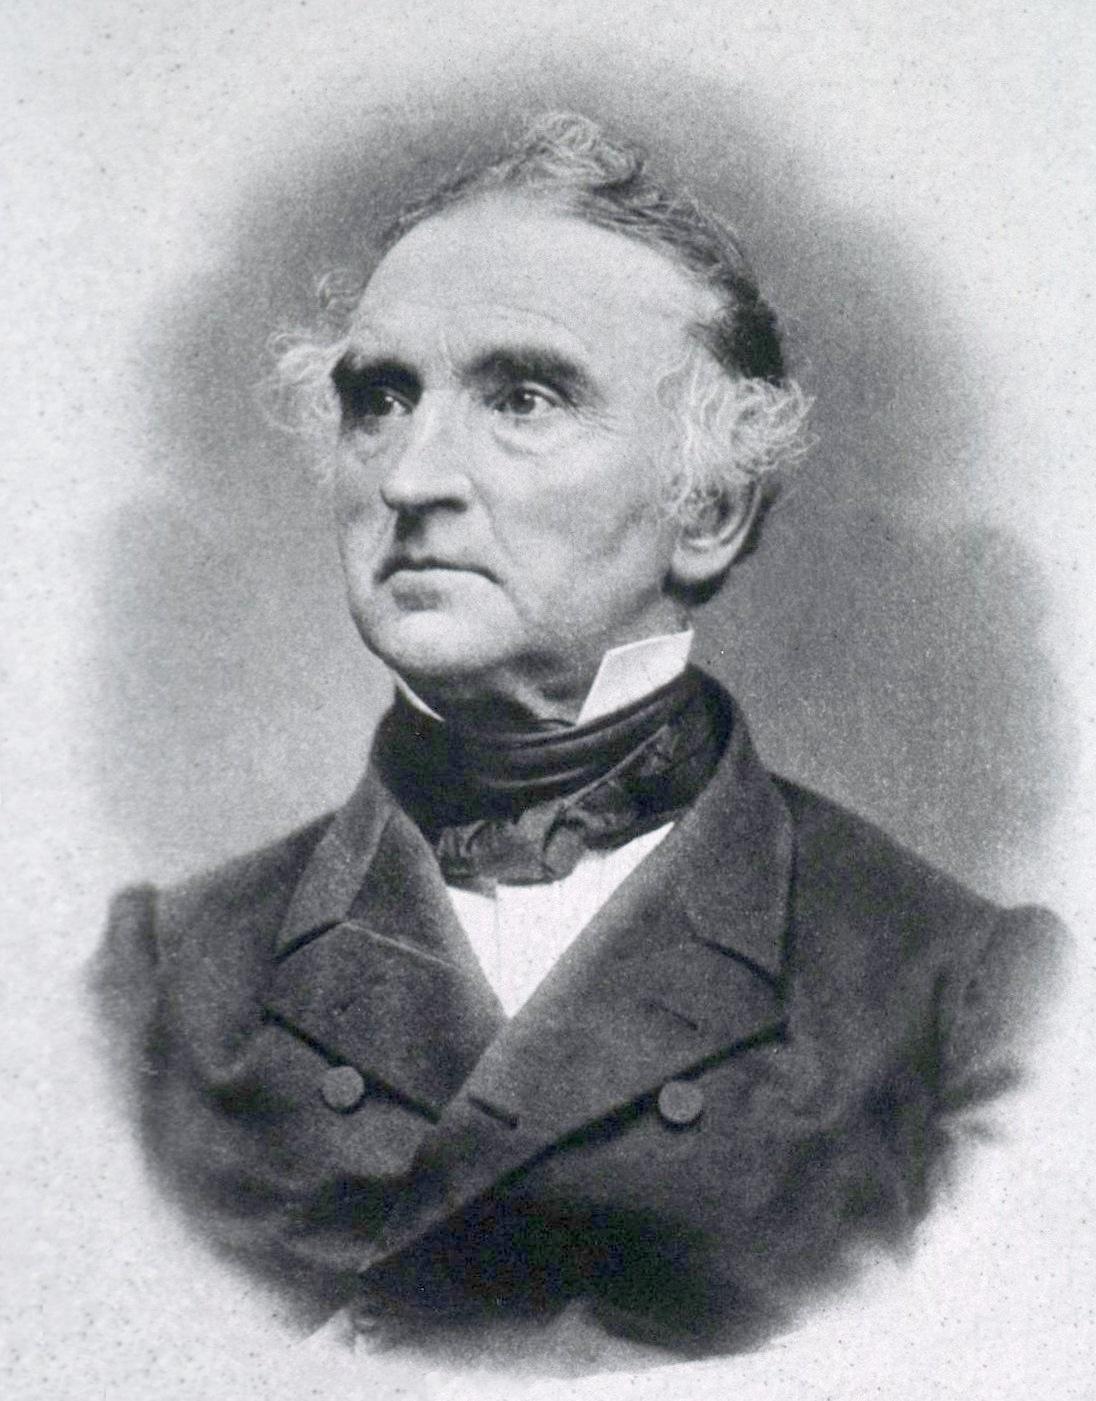 File:Justus von Liebig NIH.jpg - Wikipedia, the free encyclopedia